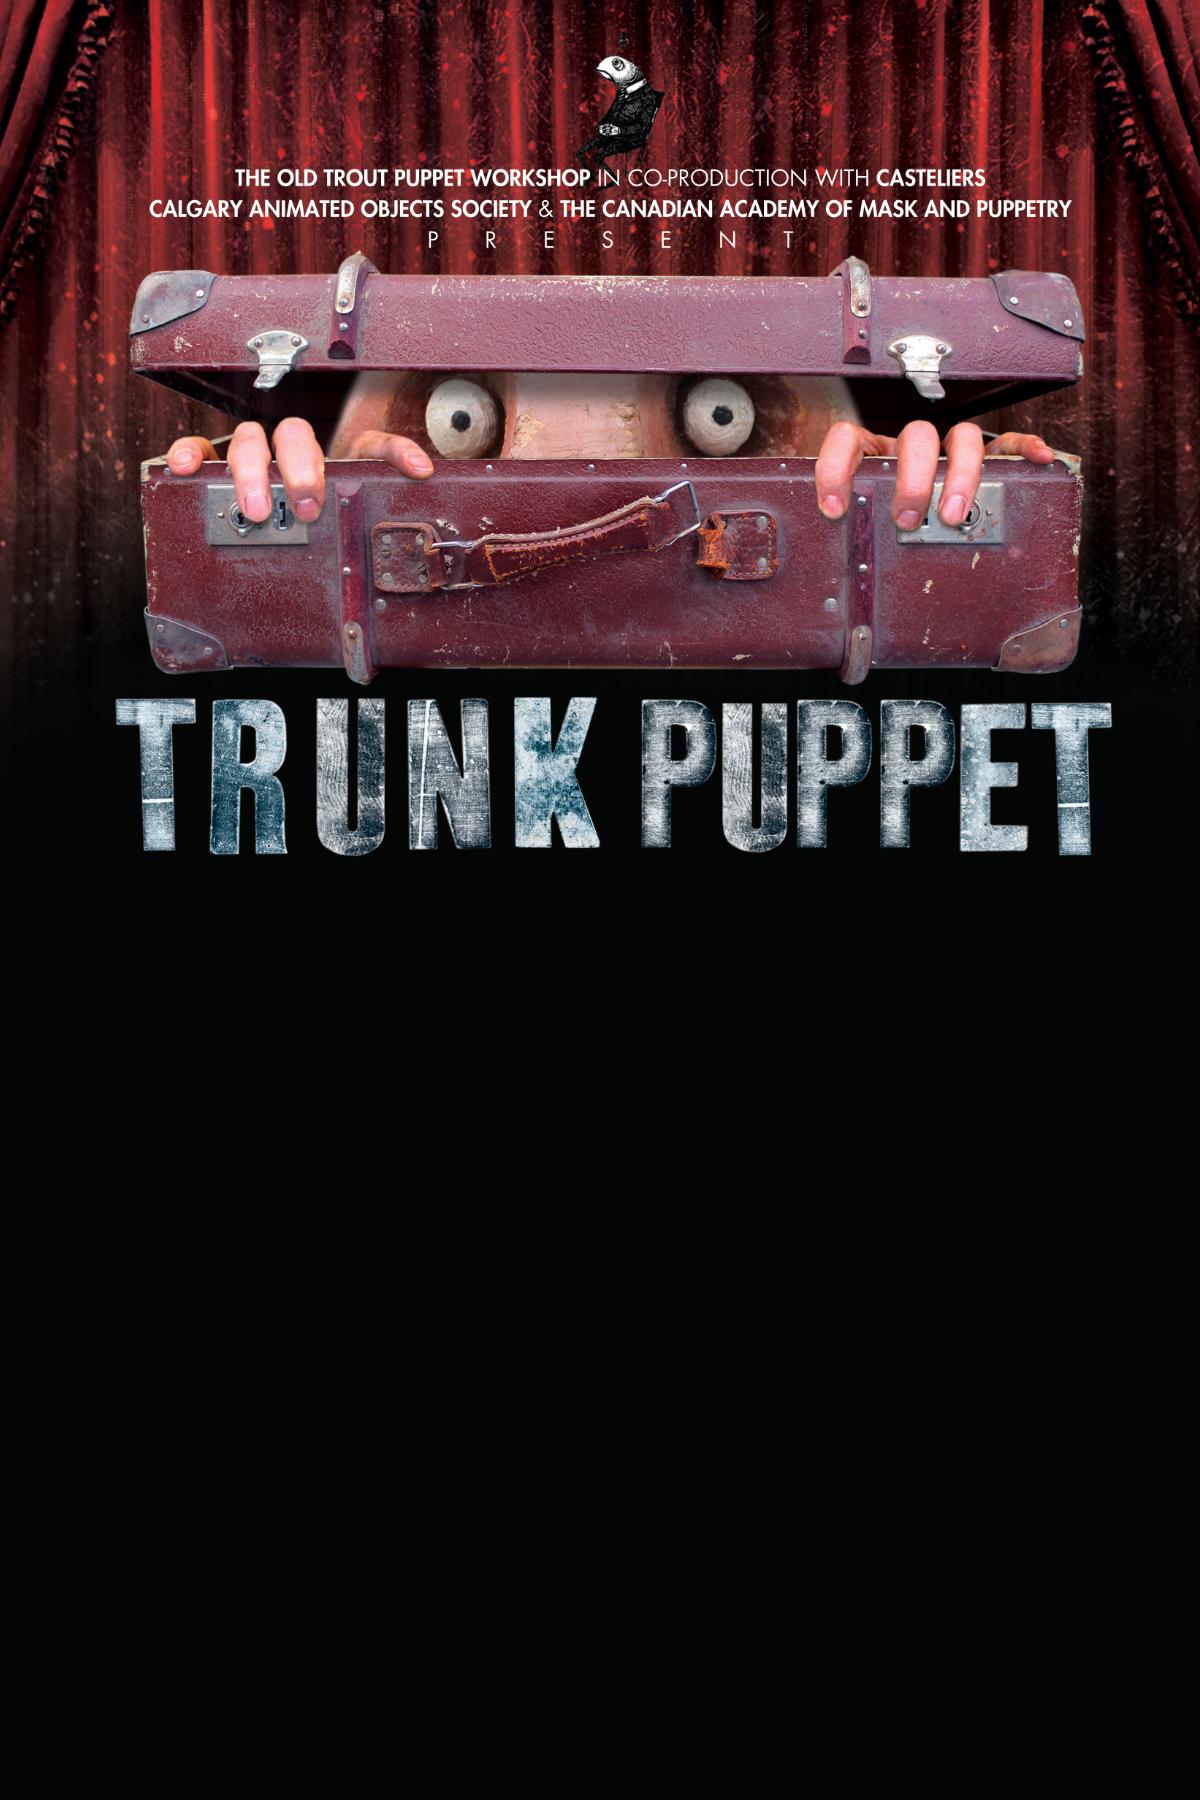 TrunkPuppet.jpg